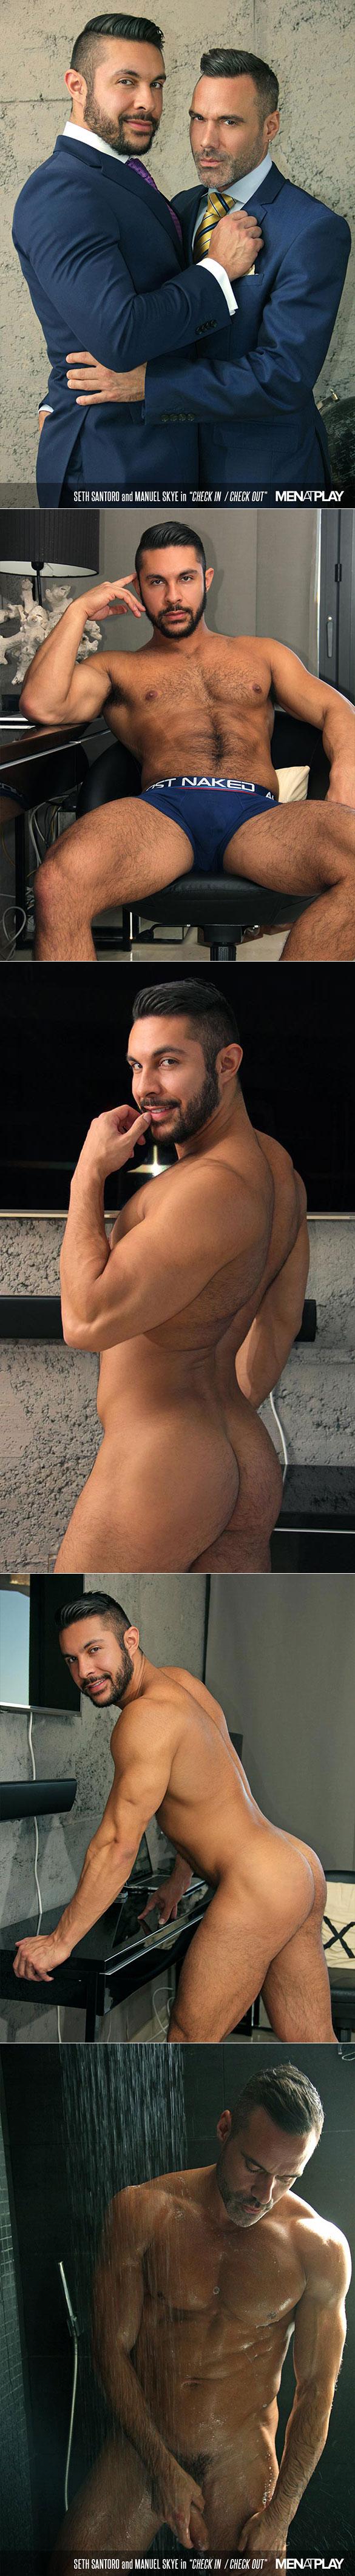 "MenAtPlay: Manuel Skye tops Seth Santoro in ""Check In / Check Out"""